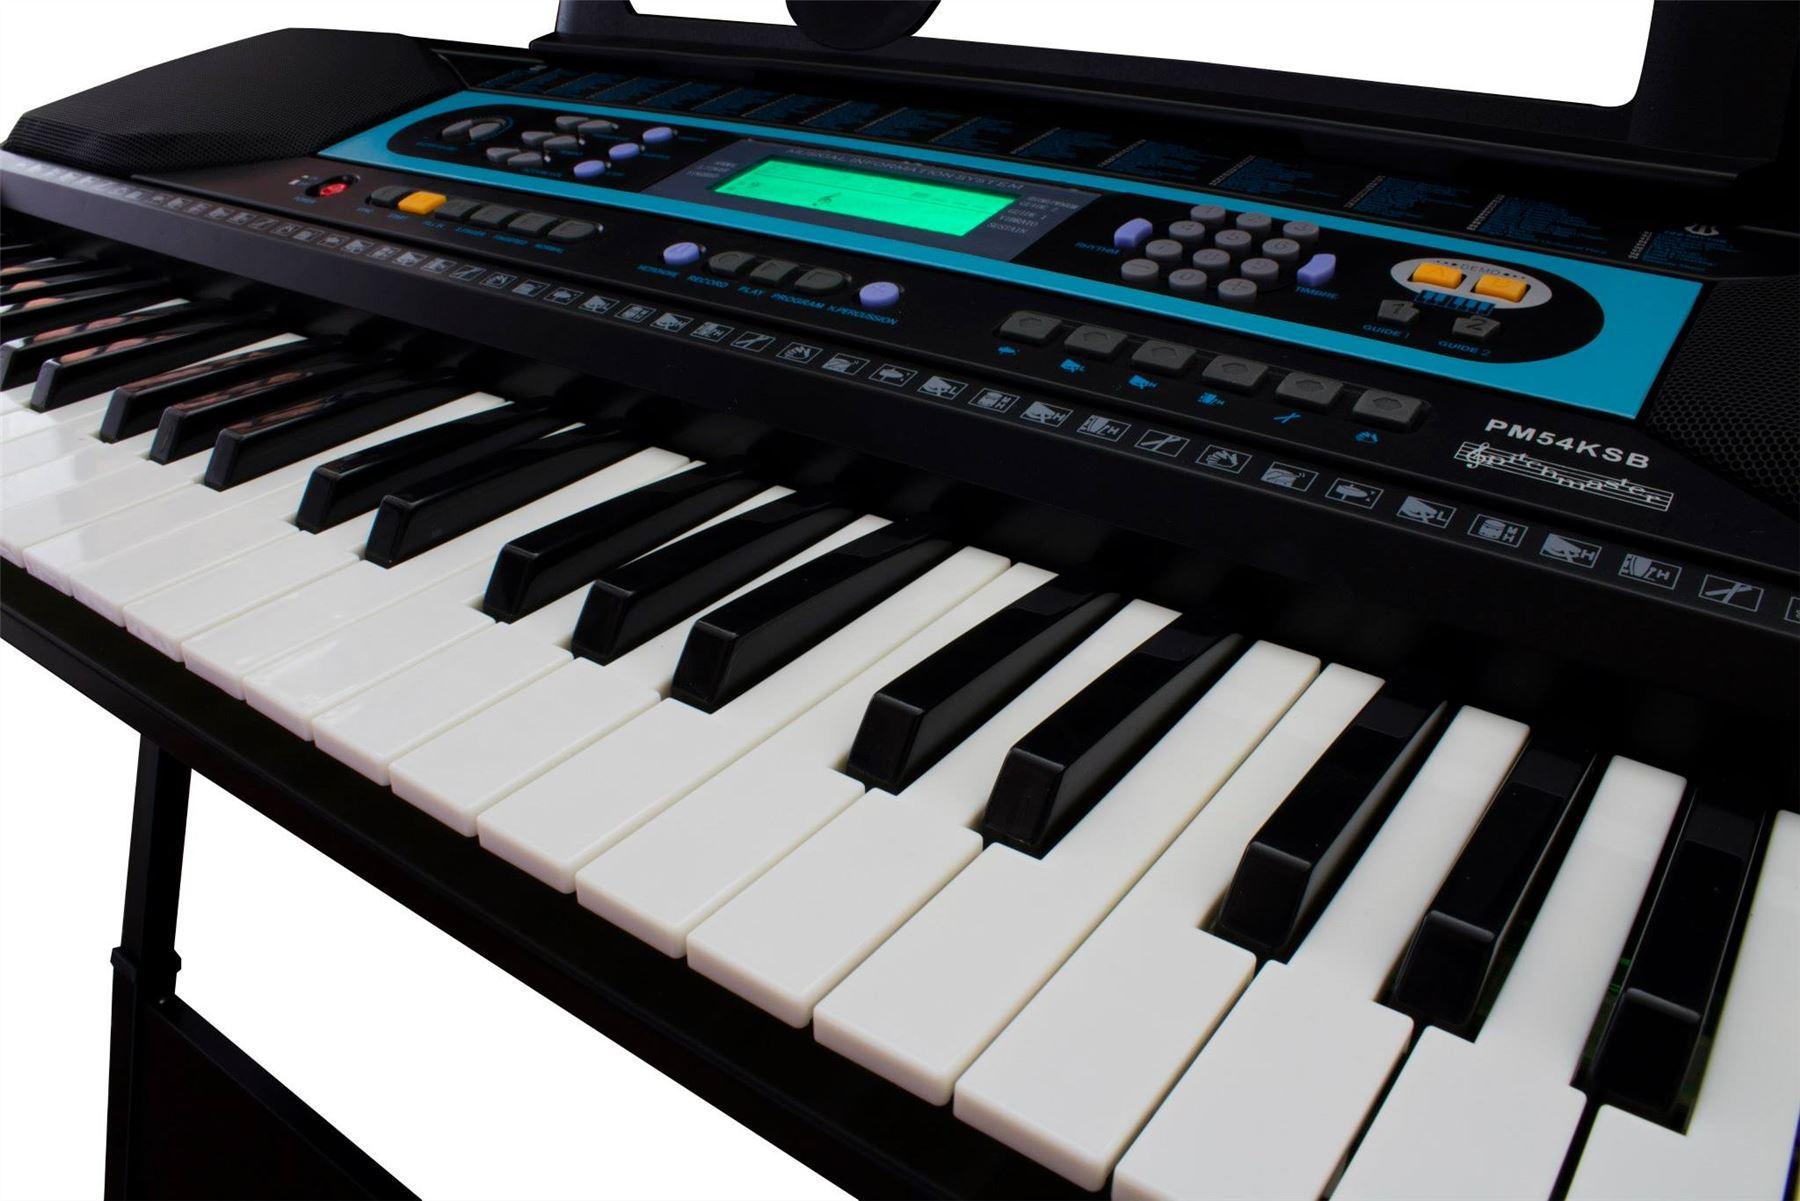 54 key digital interactive teaching portable keyboard piano workstation stand ebay. Black Bedroom Furniture Sets. Home Design Ideas